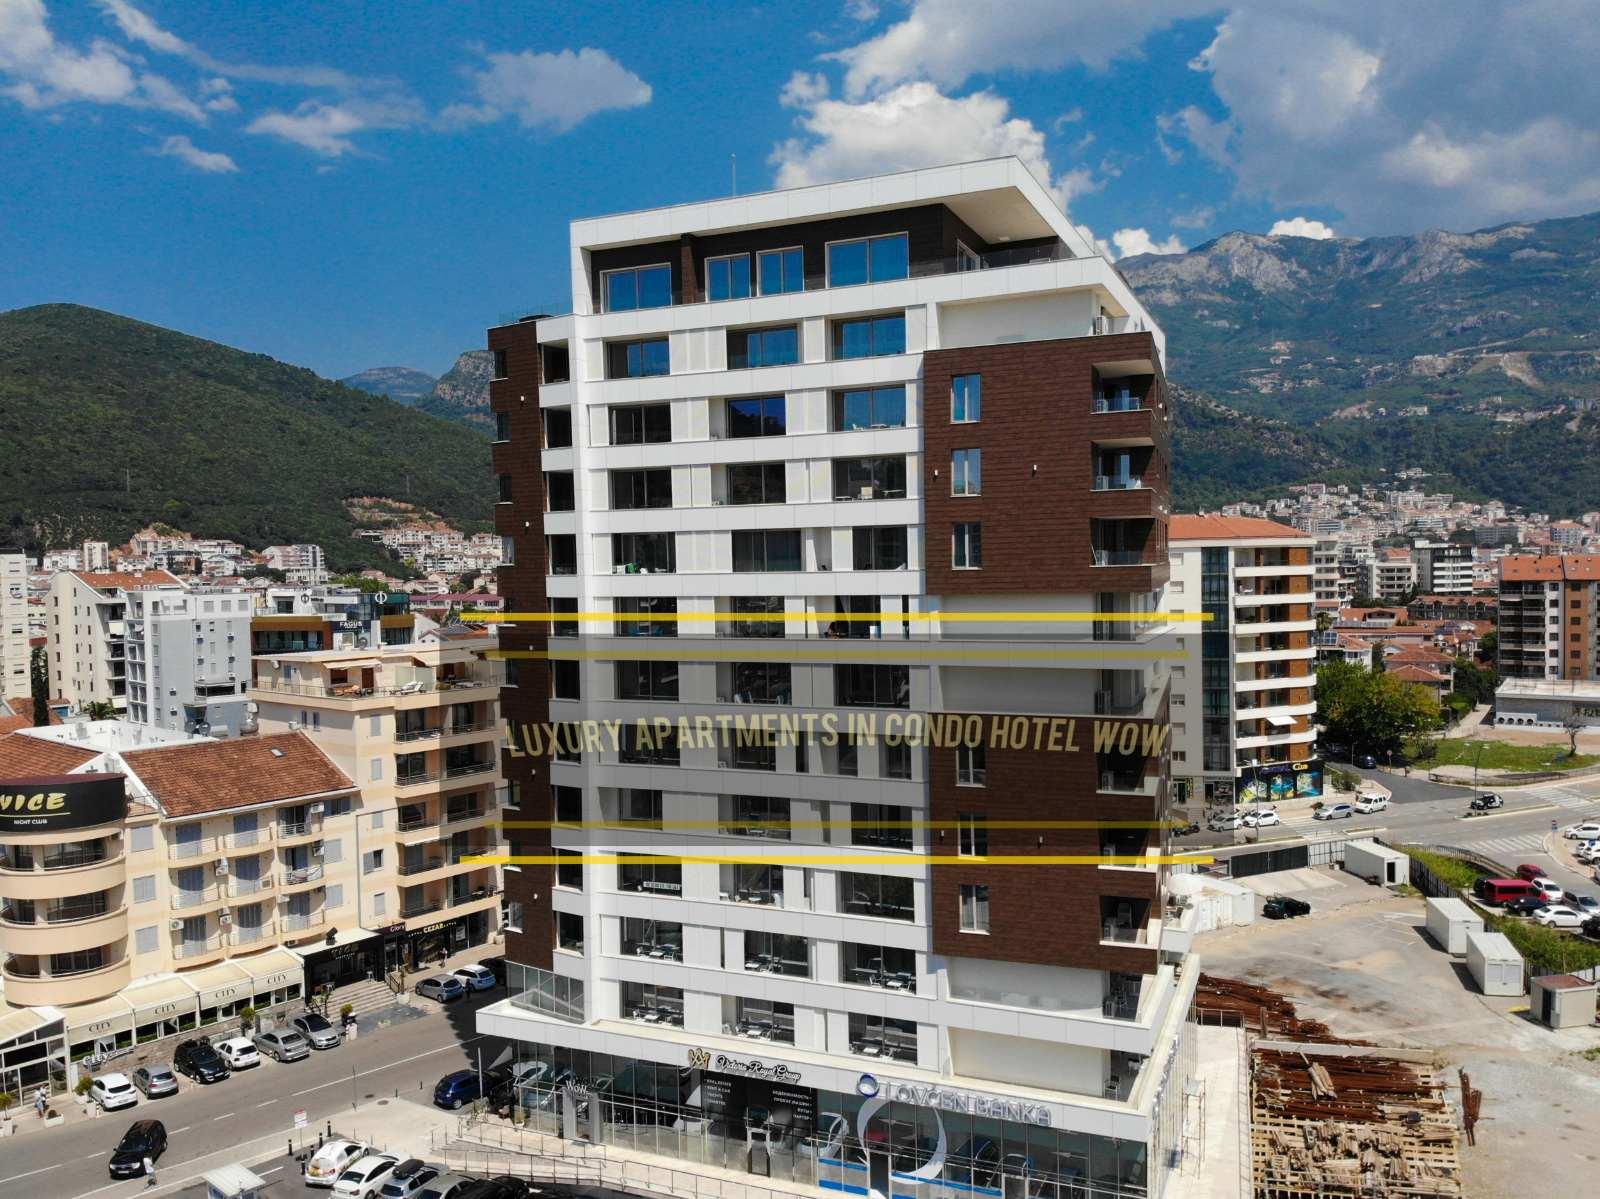 amforaproperty.com/Prodaje se garažno mesto u Condo Hotelu Wow      25 000 eur